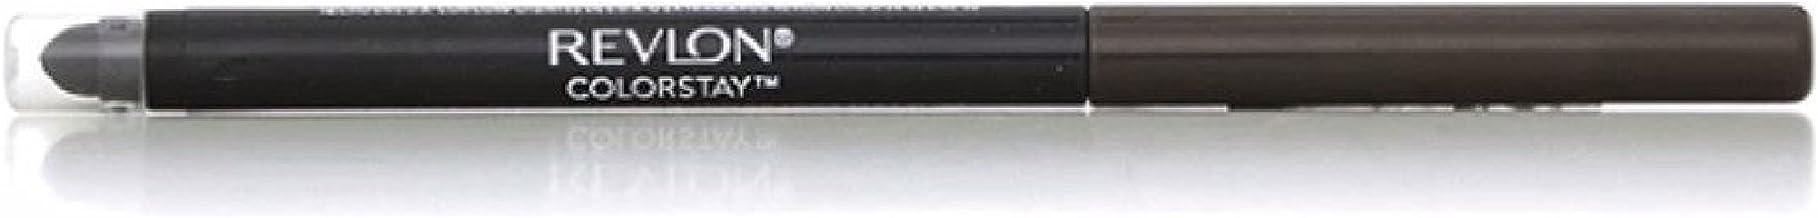 Revlon/Colorstay Eye Liner (Black Brown) 0.01 Oz (.28 Ml)